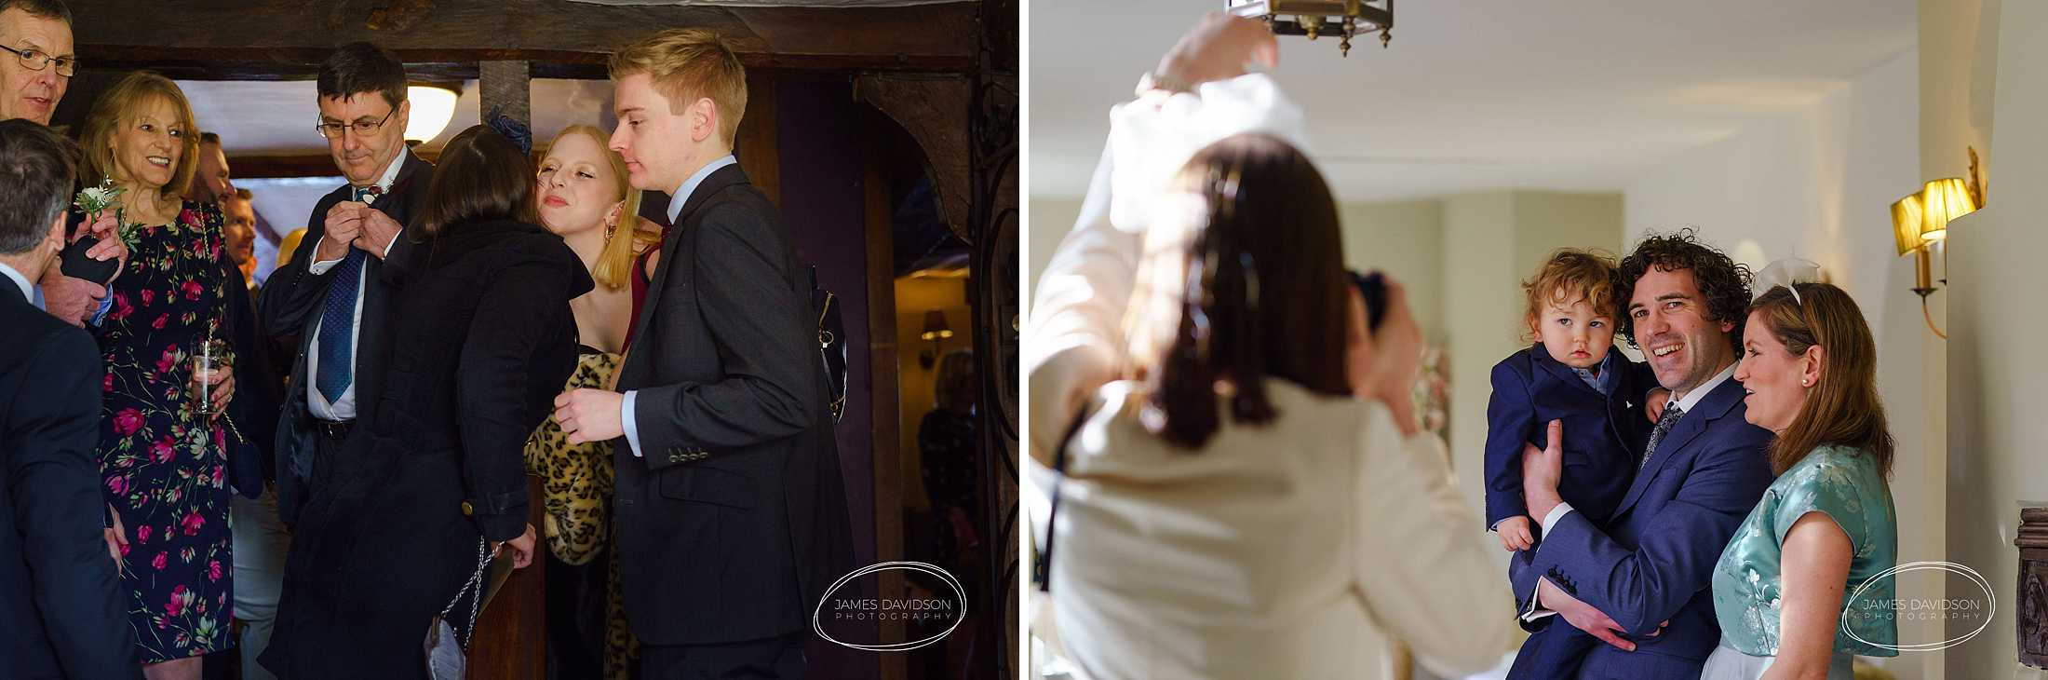 seckford-hall-wedding-023